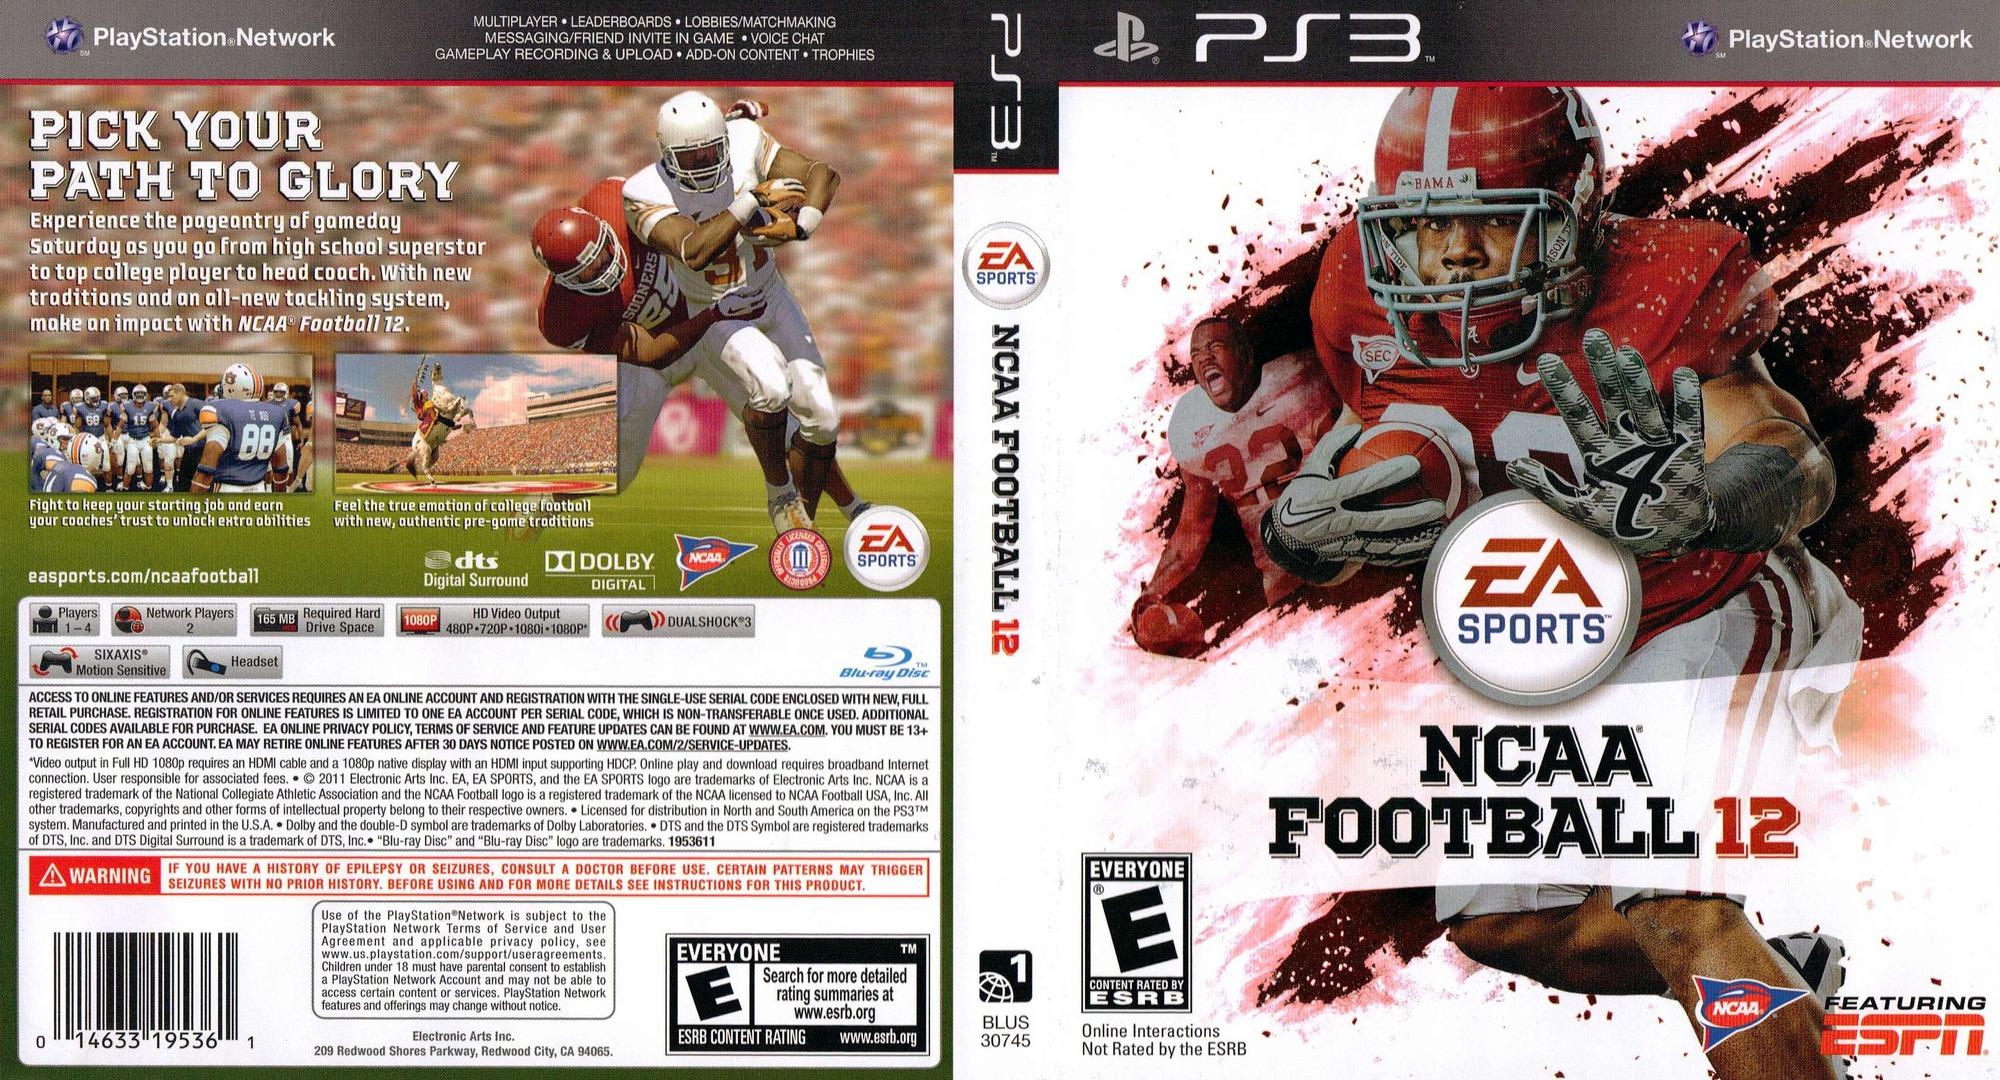 NCAA Football 12 PS3 coverfullHQ (BLUS30745)